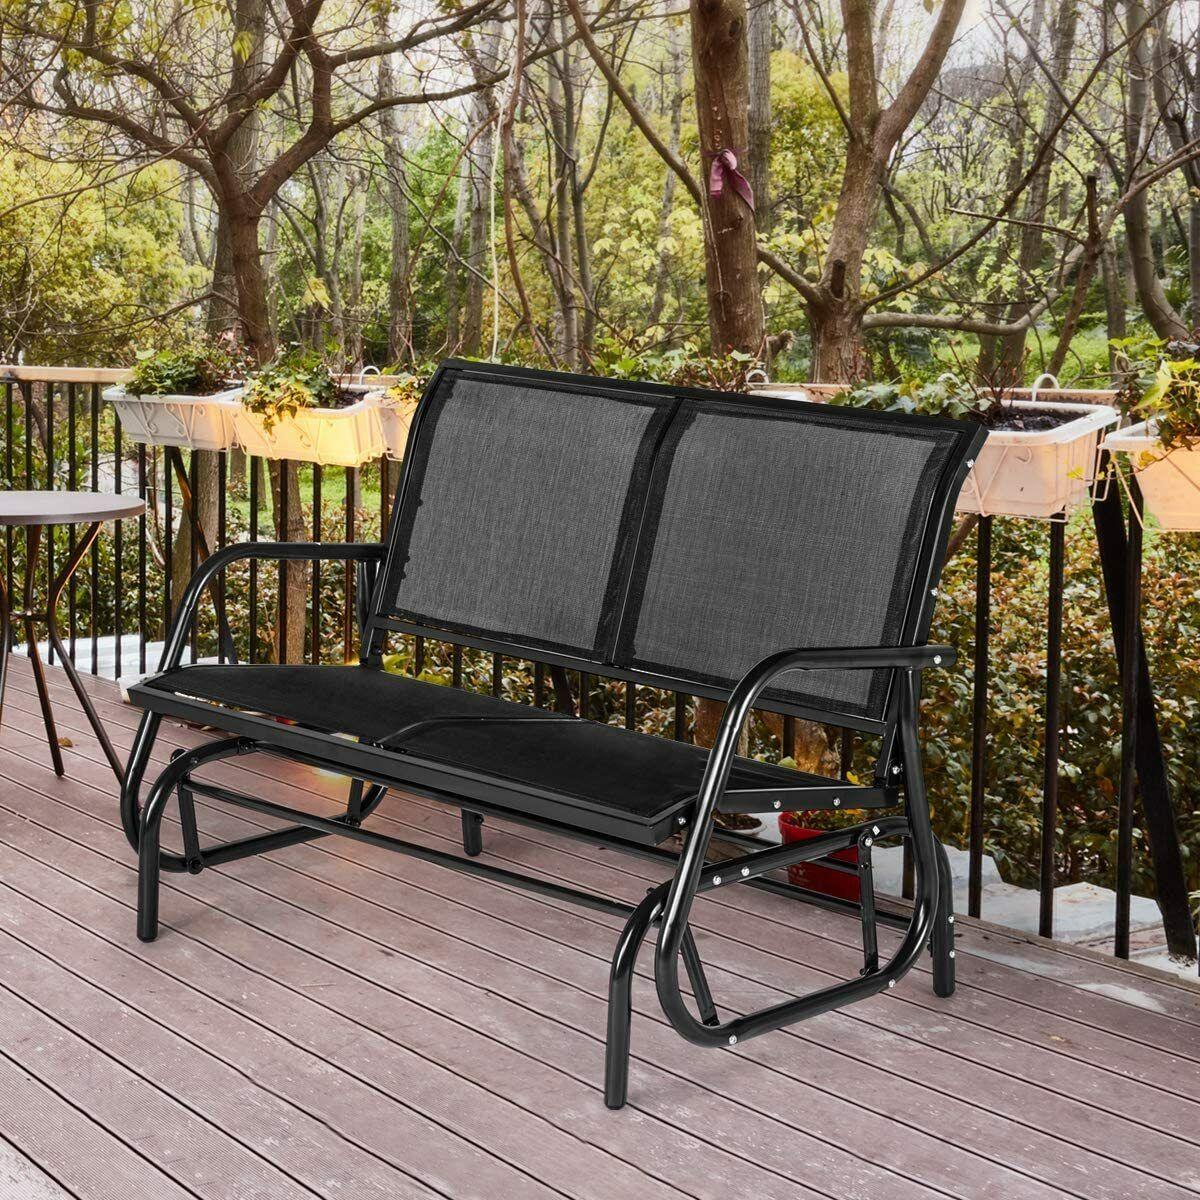 AECOJOY Outdoor Swing Glider Bench 2 Person Loveseat Patio R